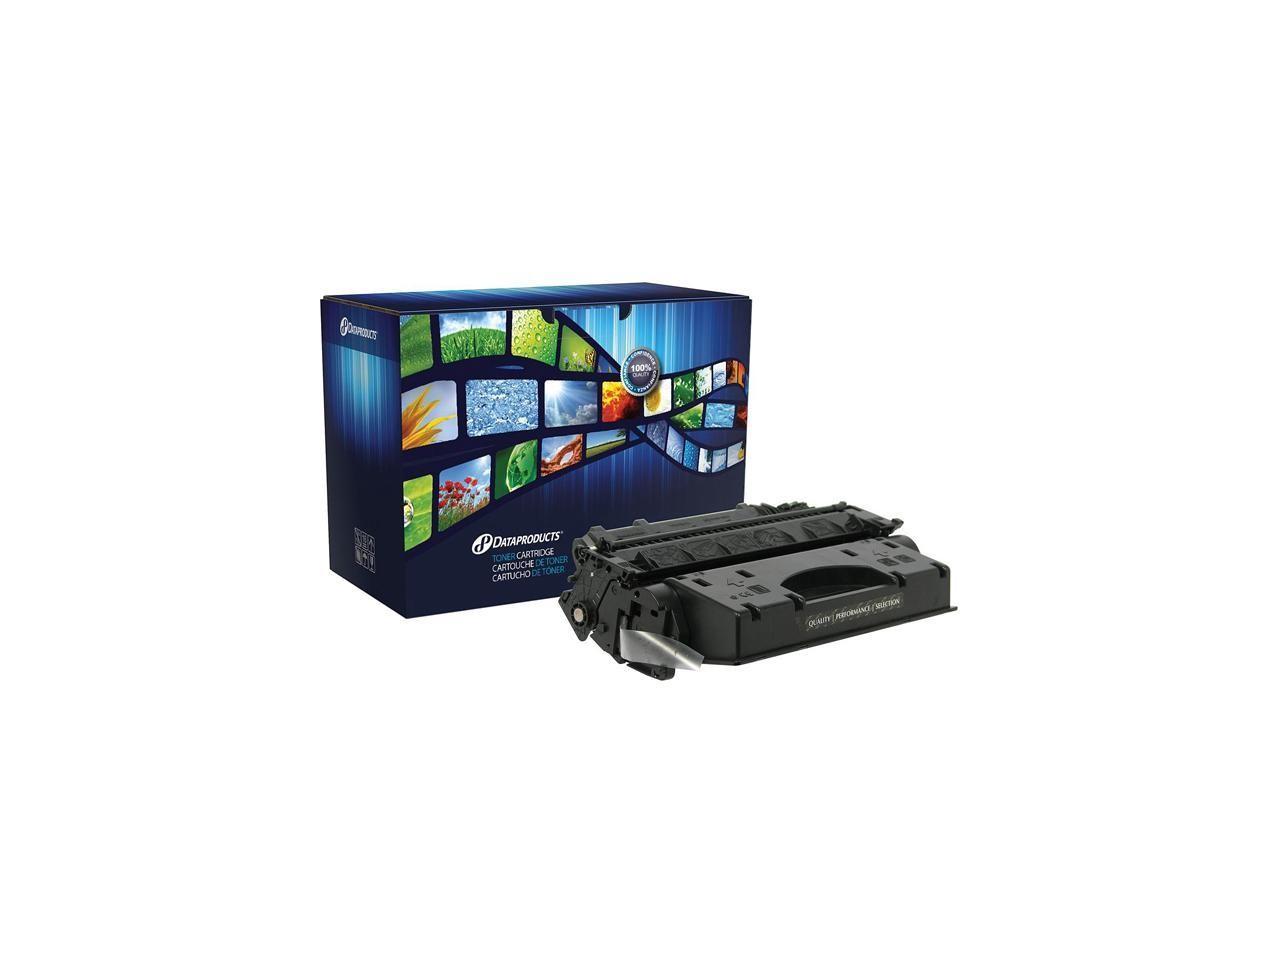 Dataproducts DPC05XP High Yield Black Toner Cartridge